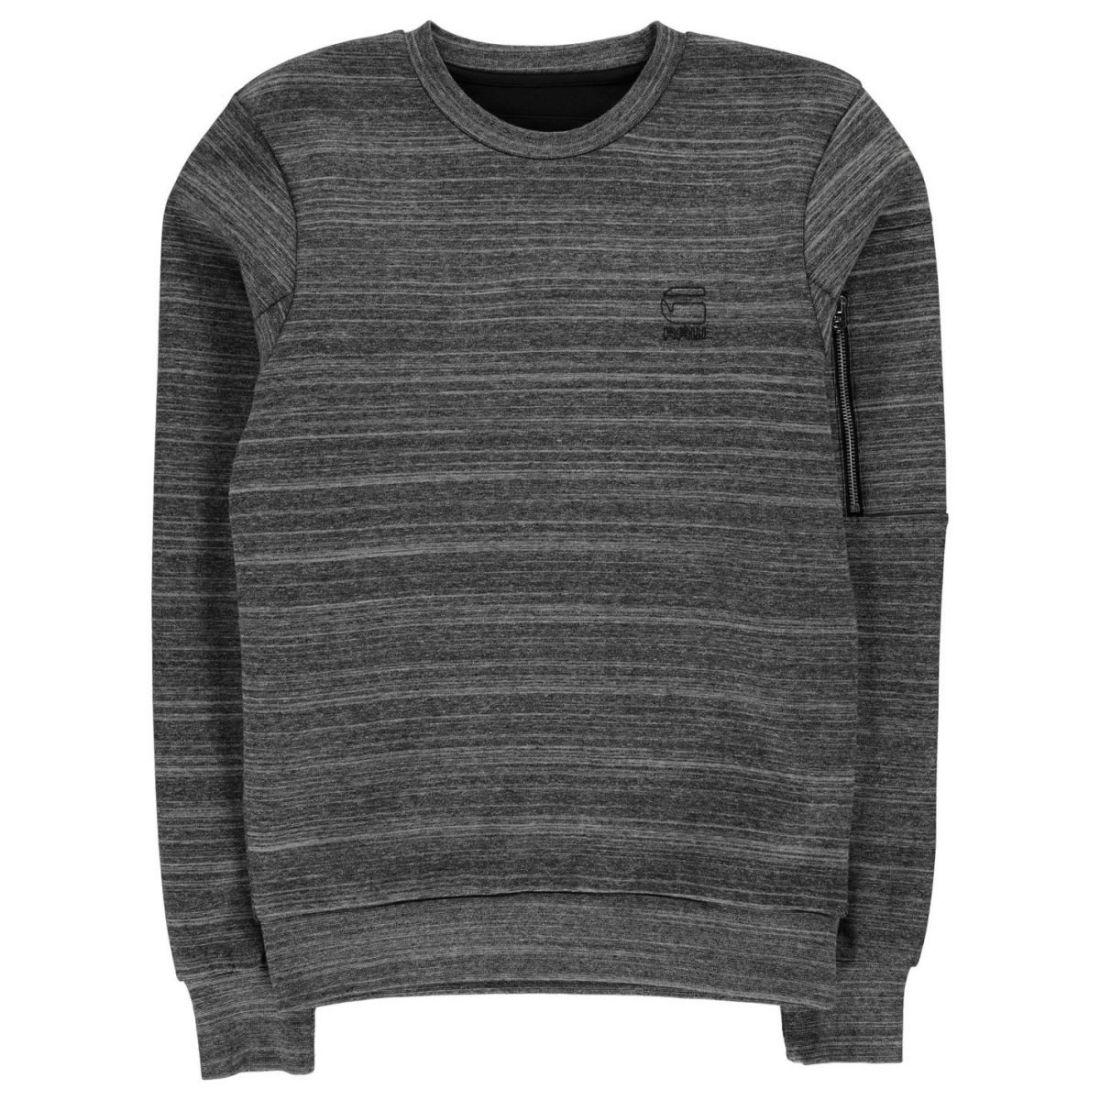 Tops & Tees Obliging Mens Black T Shirt Star Wars Death Star Christmas Shirt Size Lg Large